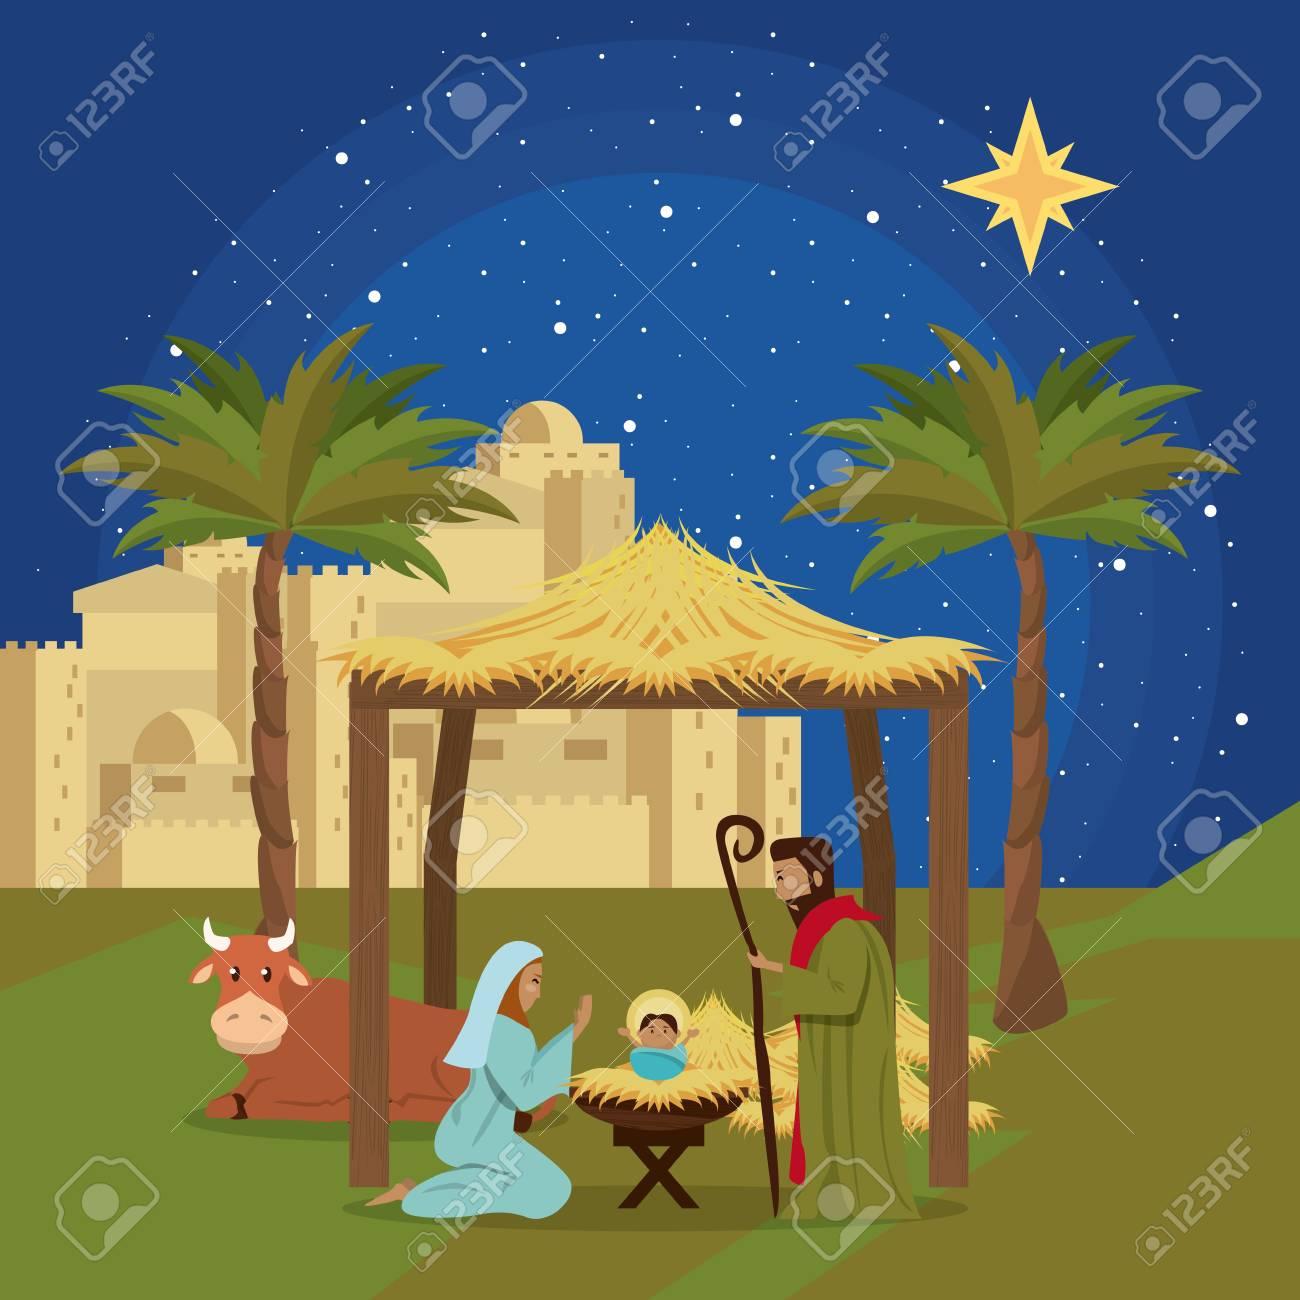 Christmas Jesus.Traditional Christian Christmas Nativity Scene Of Baby Jesus